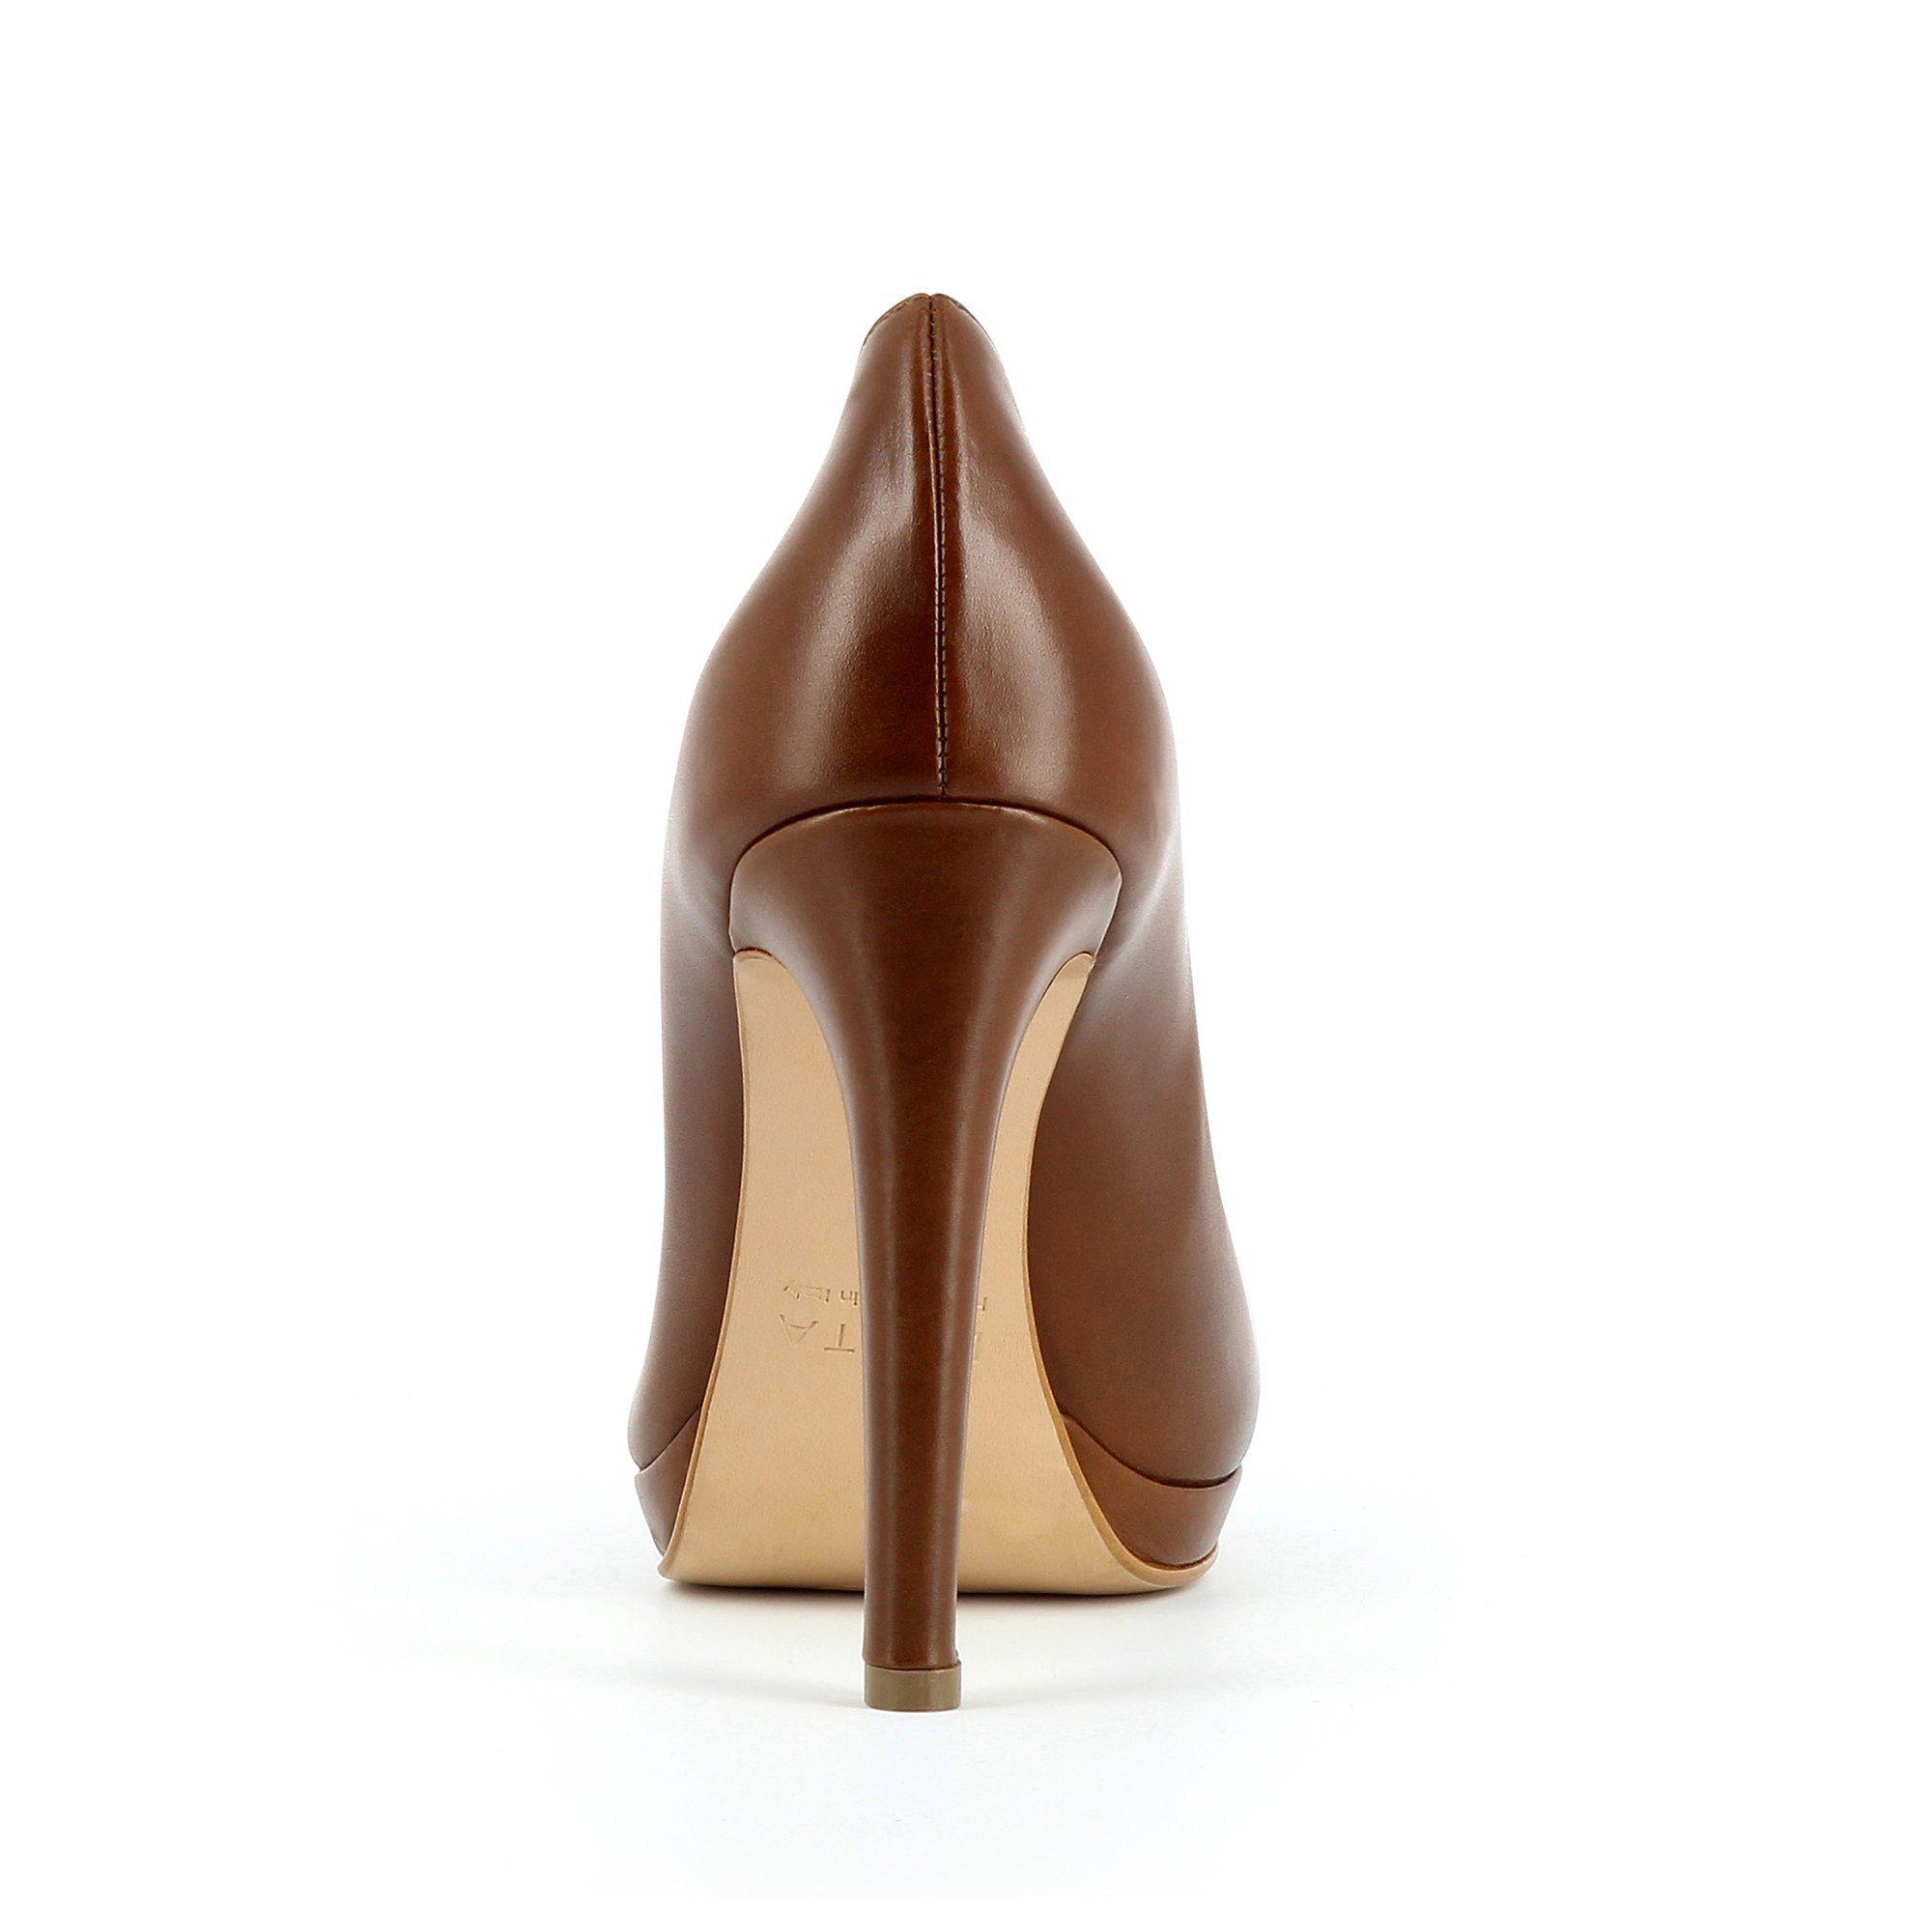 Evita CRISTINA Pumps online kaufen  cognac